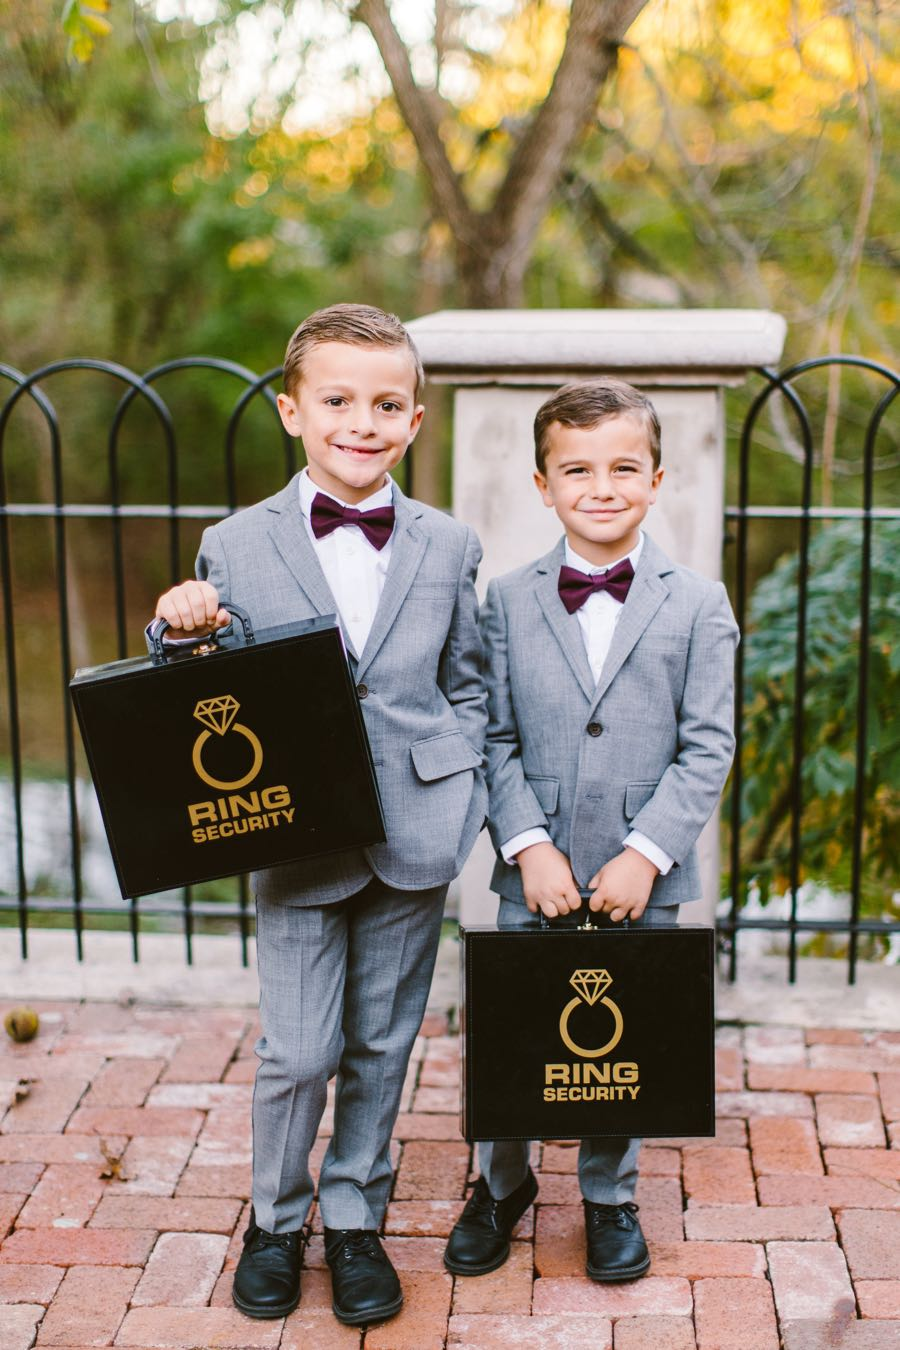 Wedding ring bearers